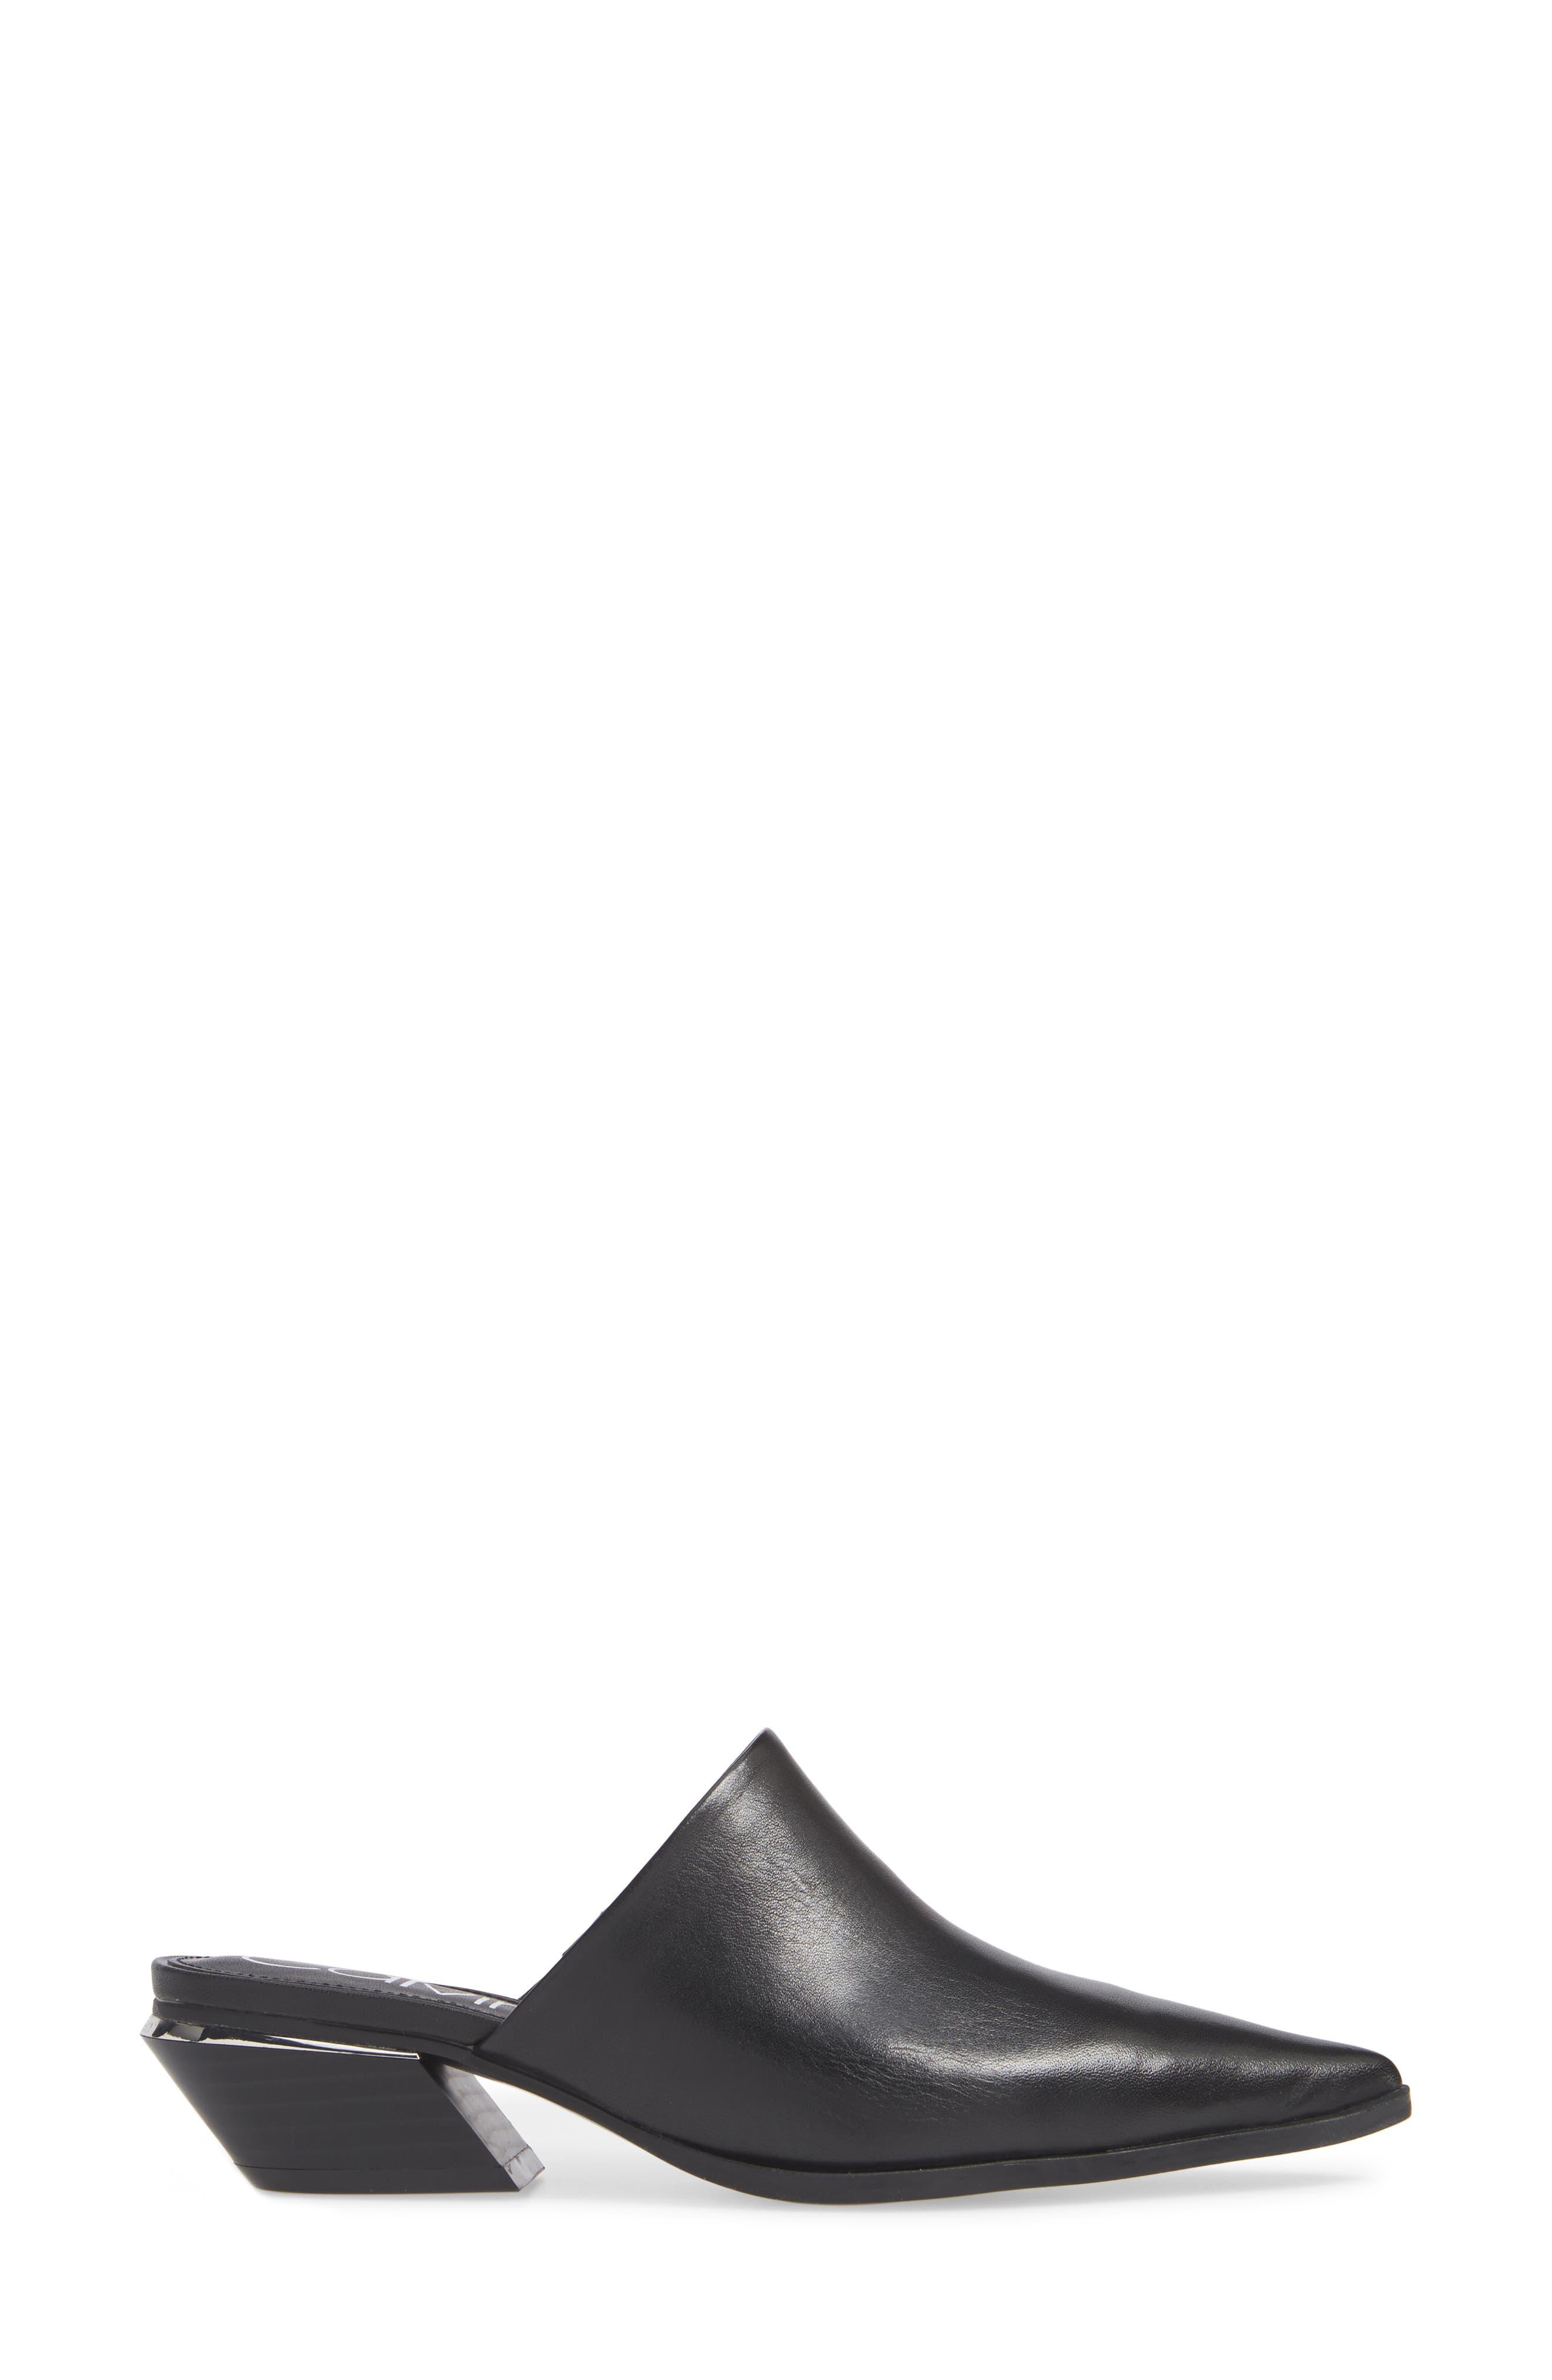 CALVIN KLEIN, Nafese Mule, Alternate thumbnail 3, color, BLACK LEATHER